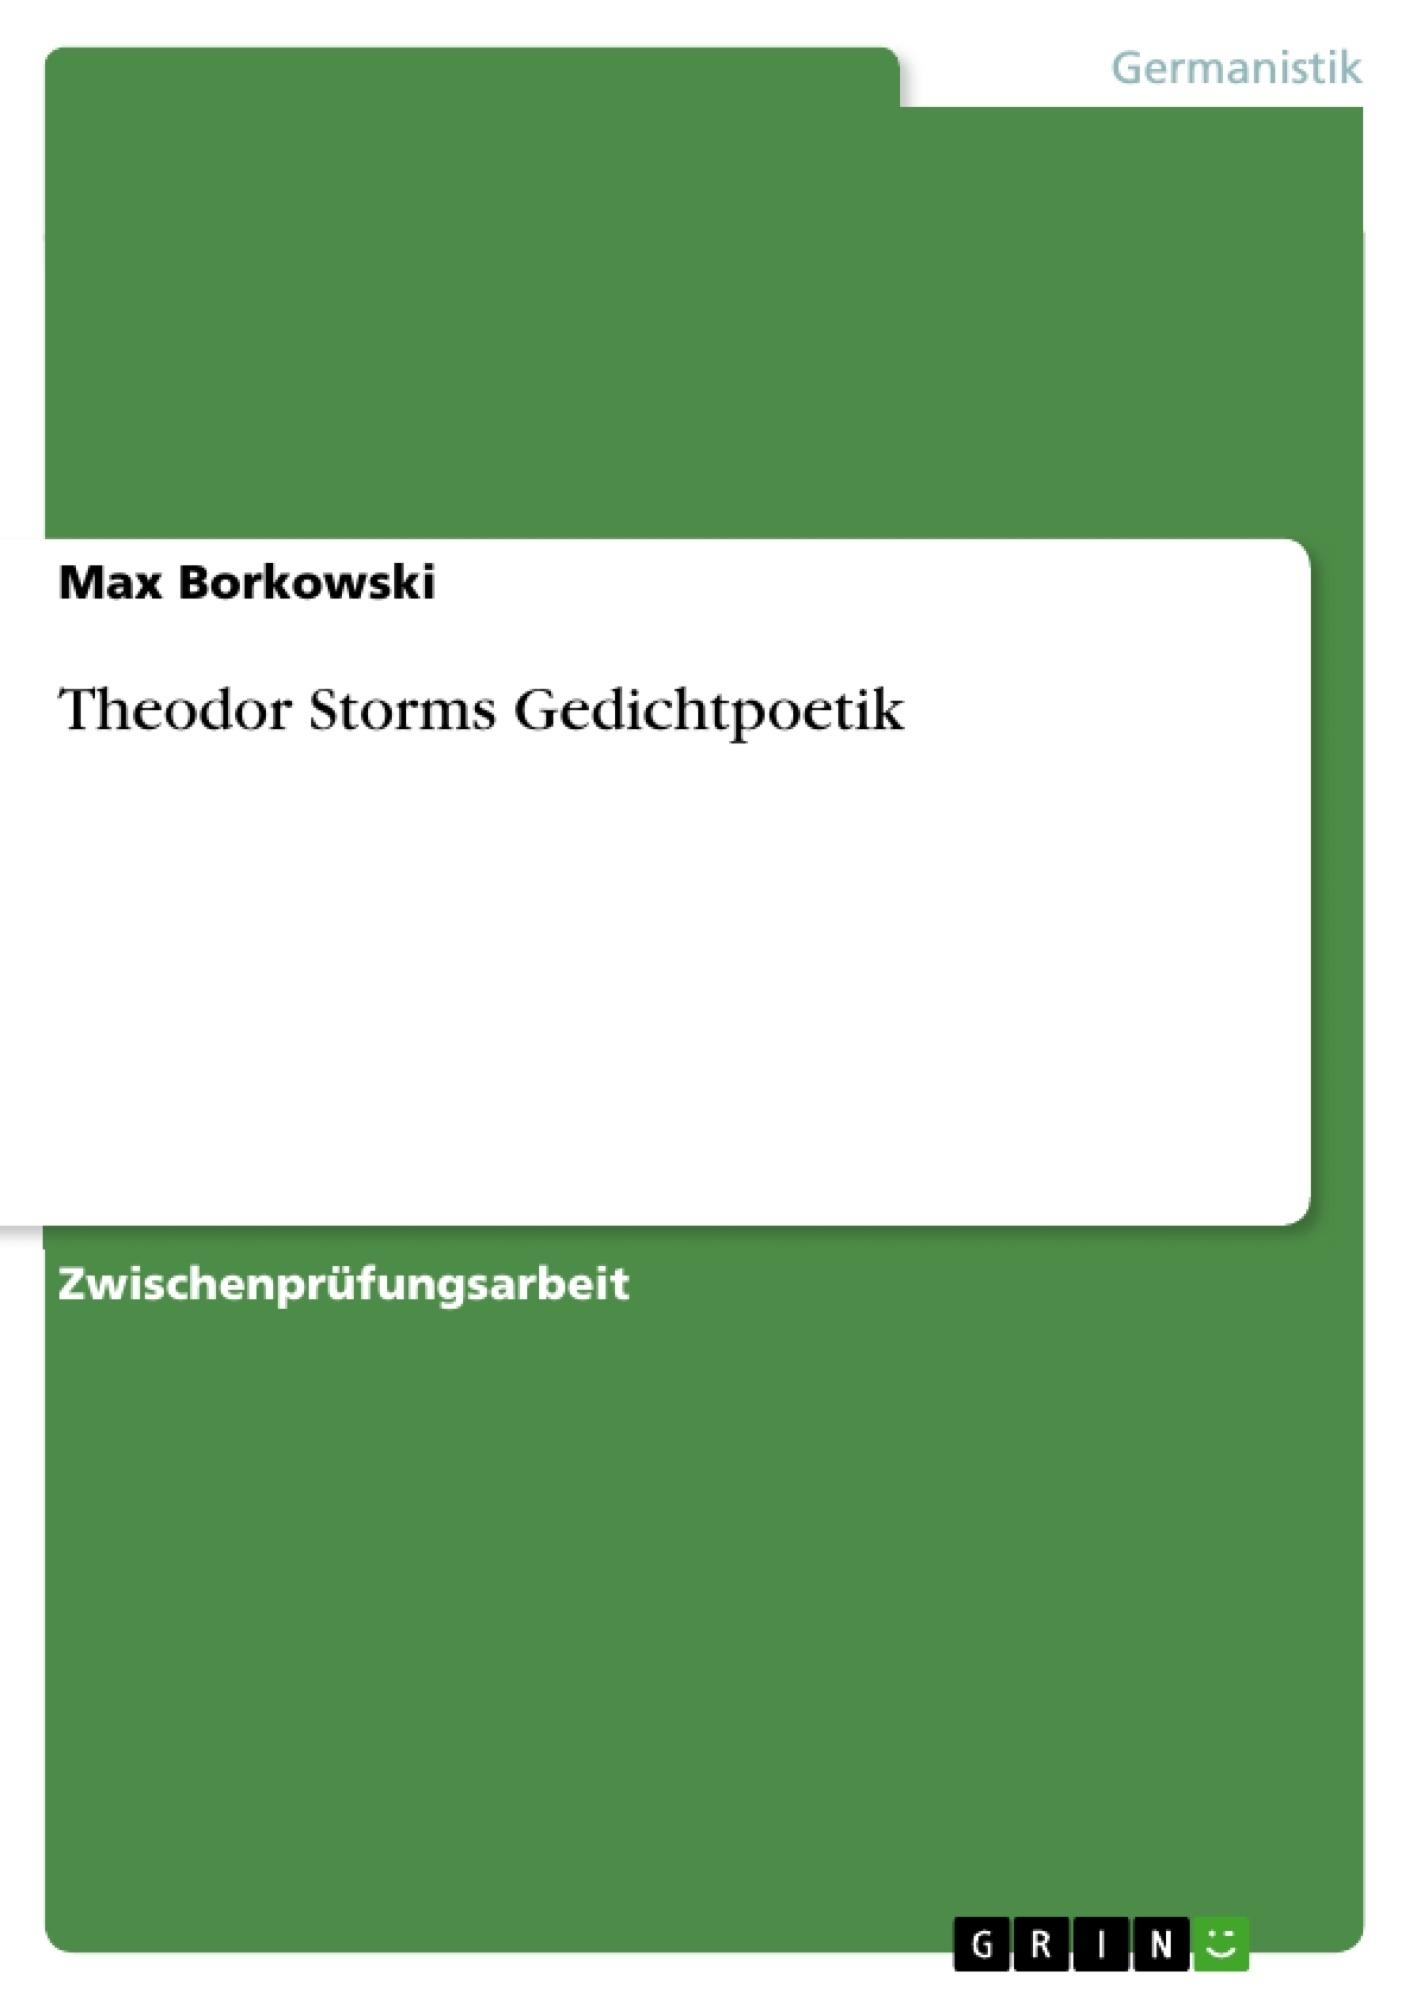 Titel: Theodor Storms Gedichtpoetik